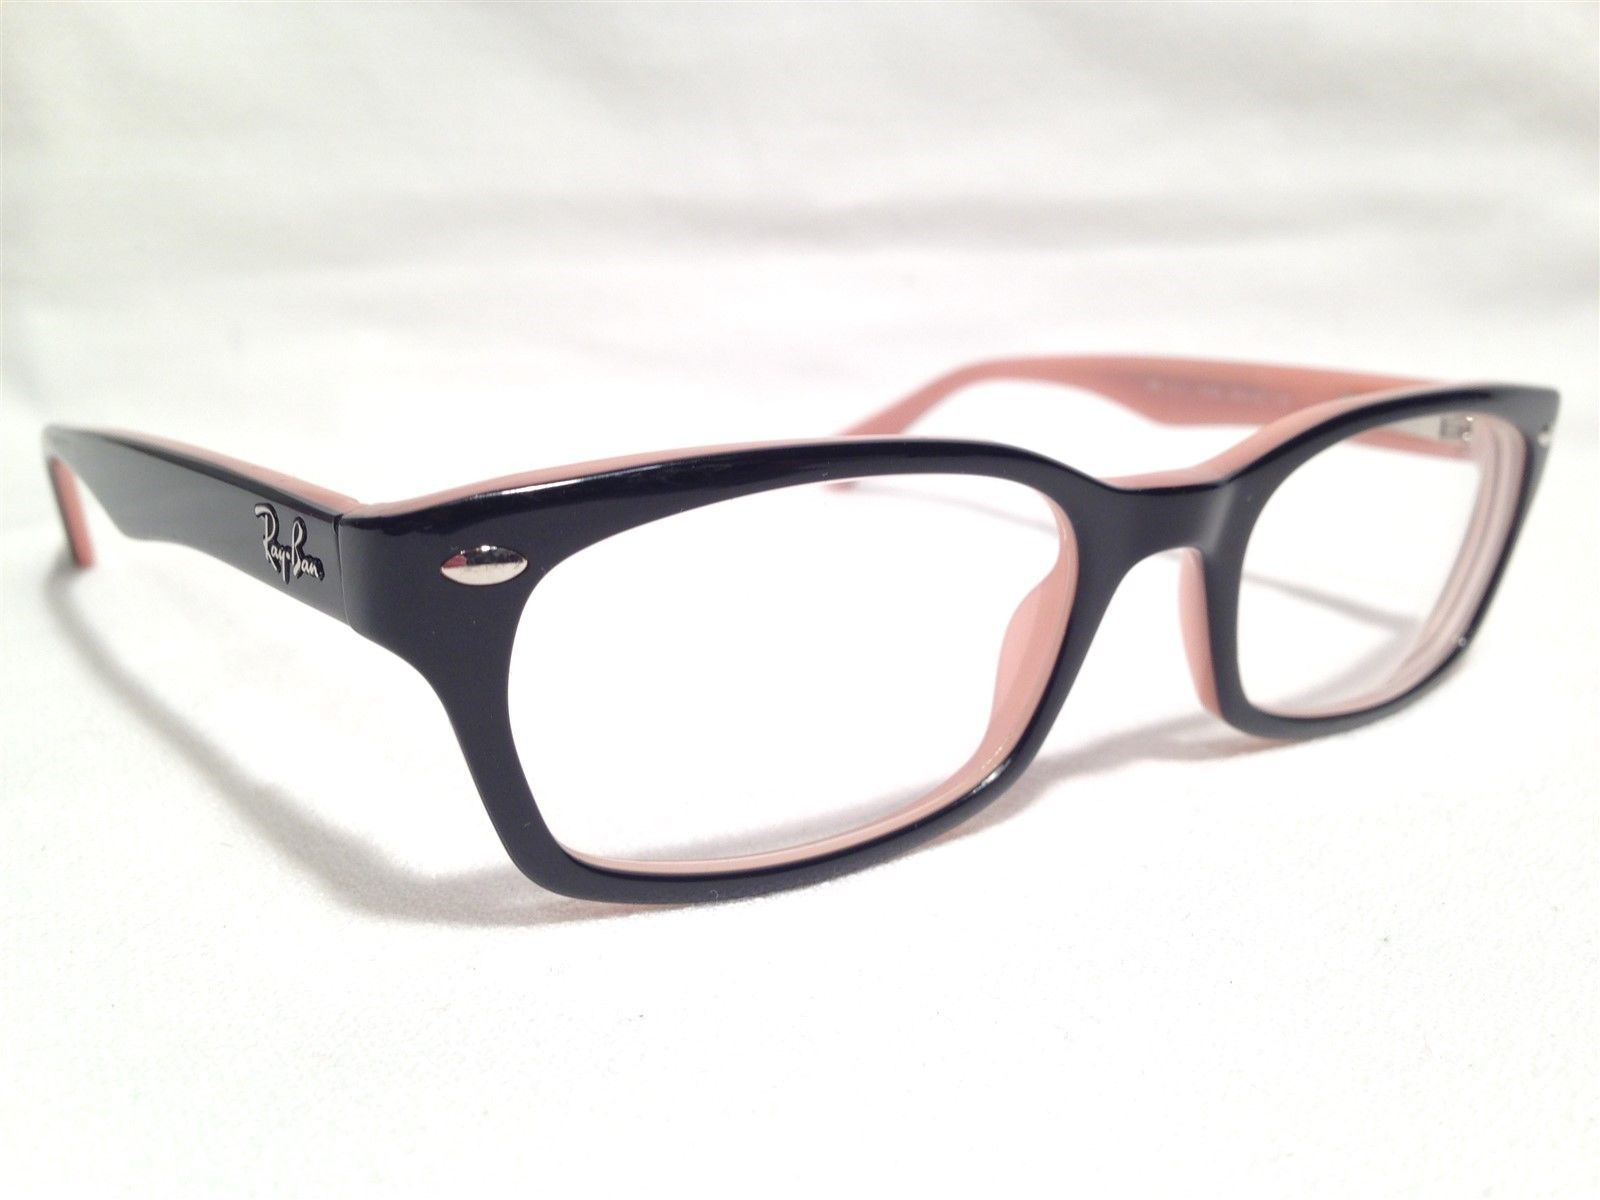 8d823b3754 Ladies Glasses Frames